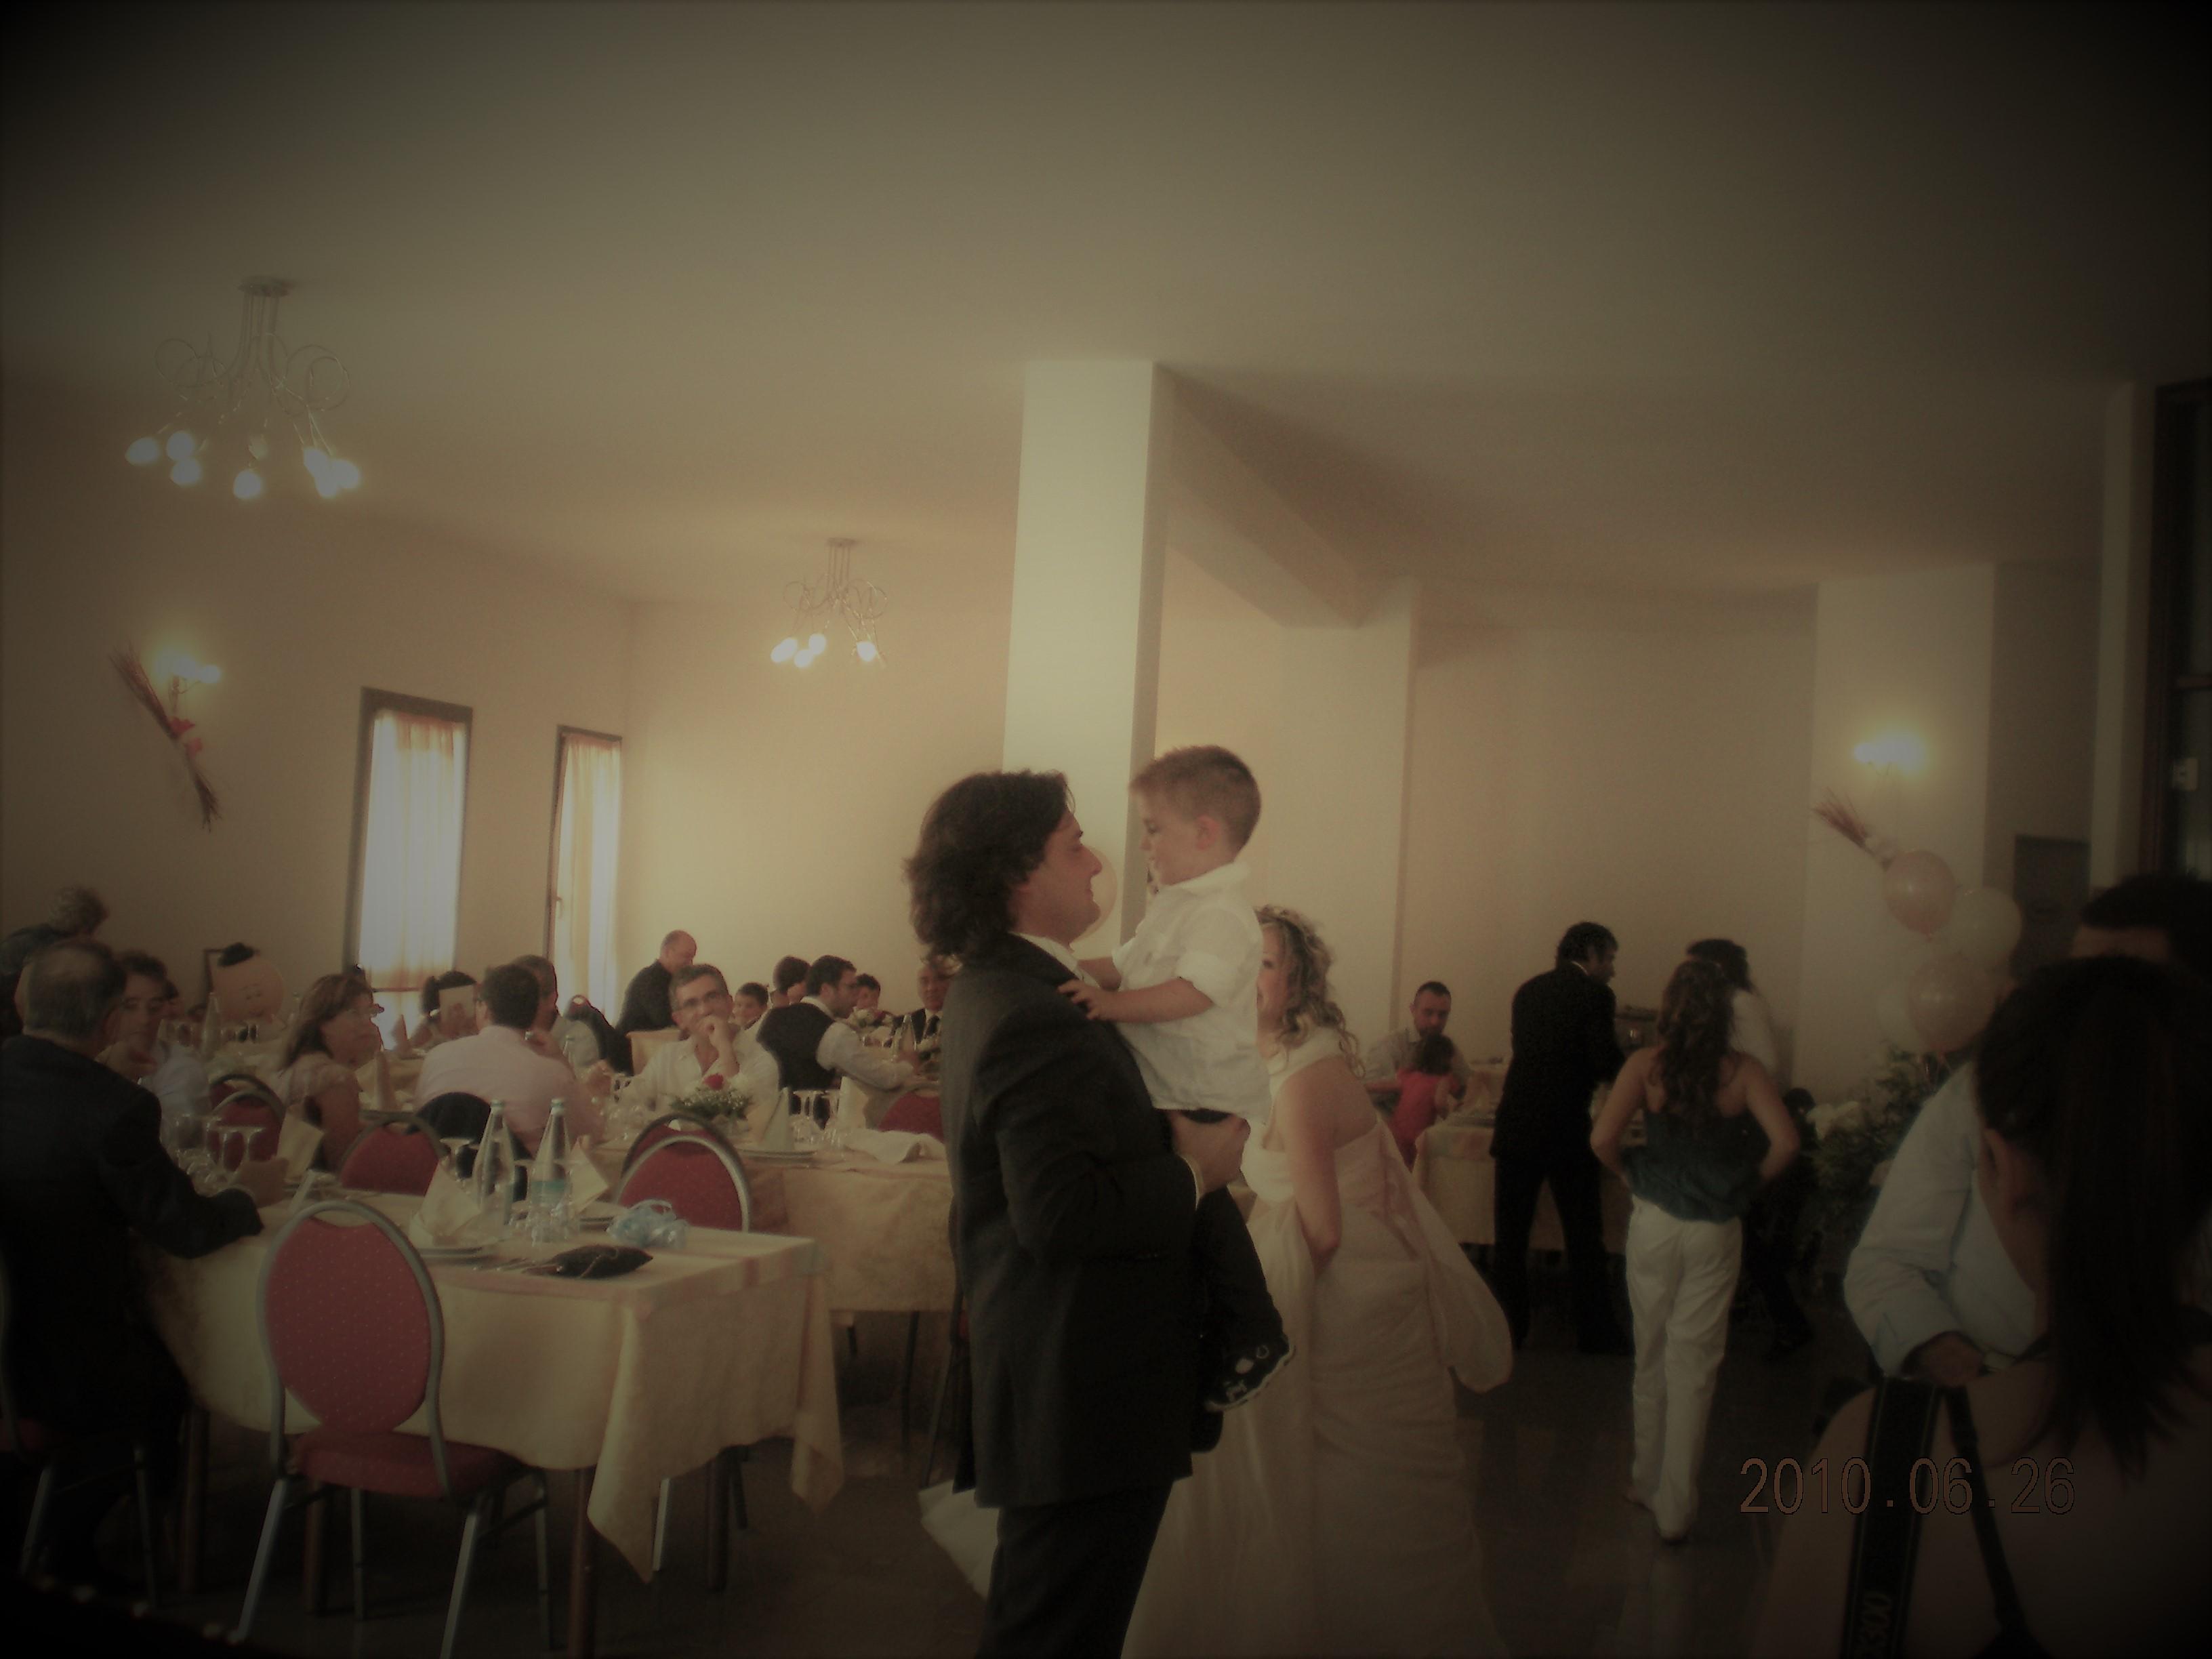 Francesco e Rosanna - 26.06.2010 - 007.JPG